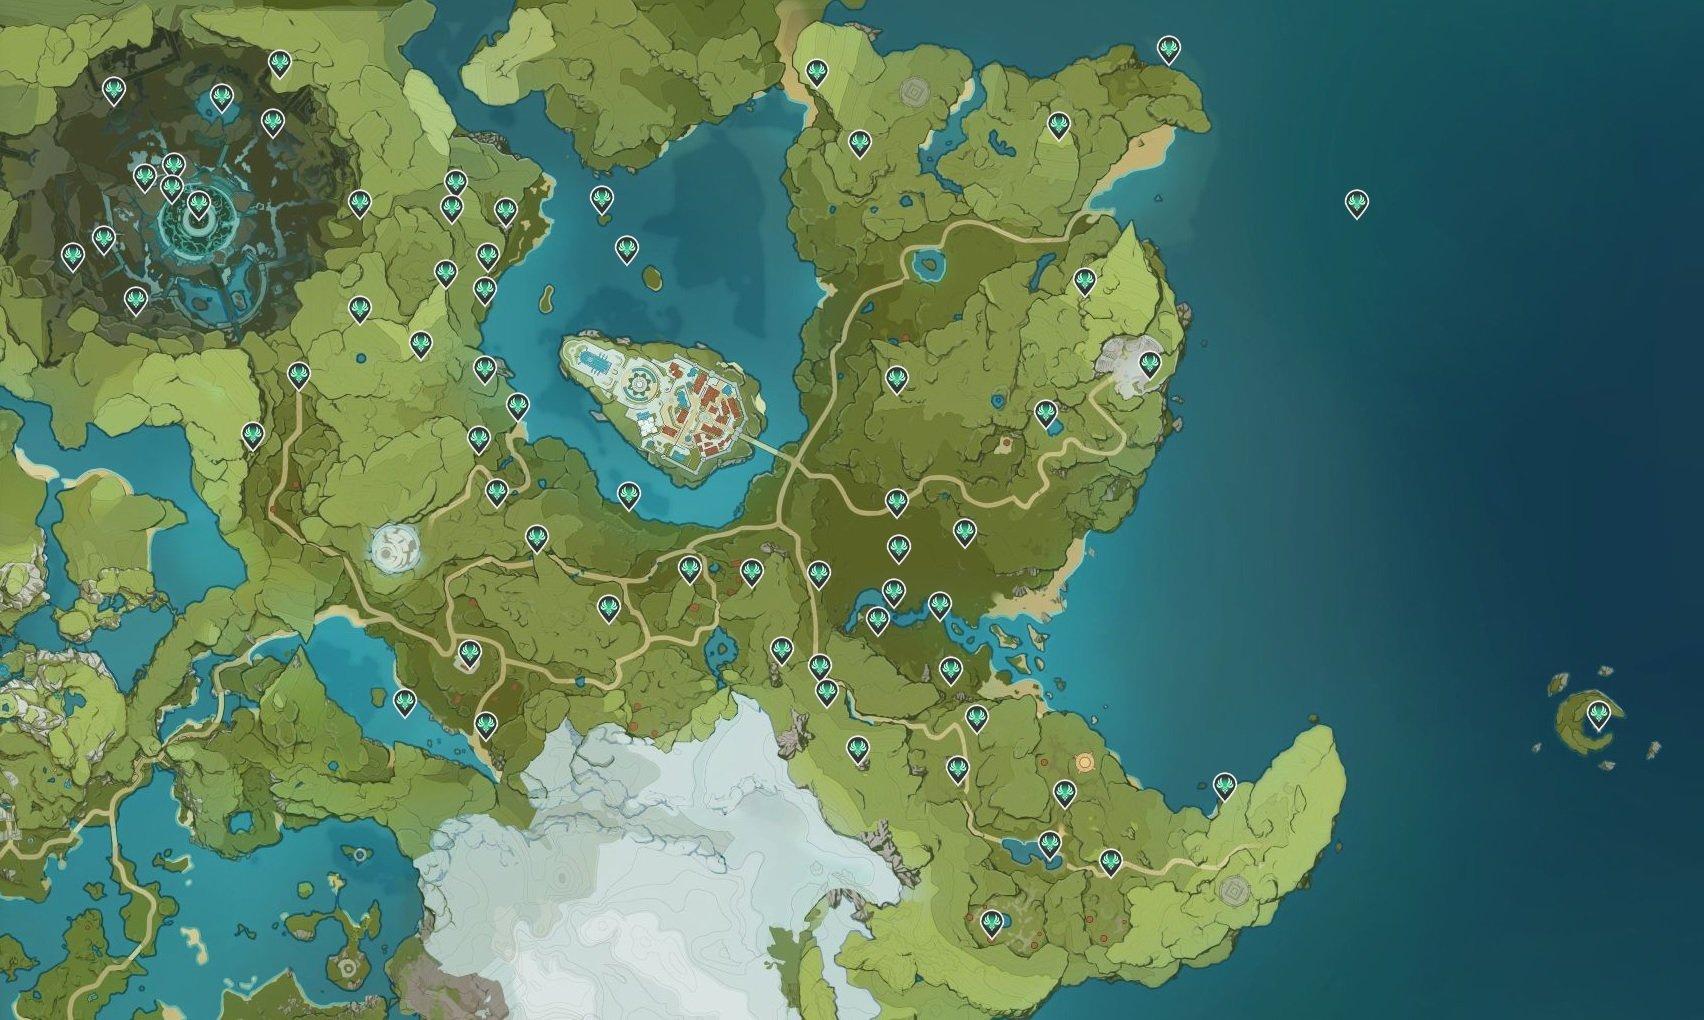 Genshin Impact Anemoculus locations map © miHoYo